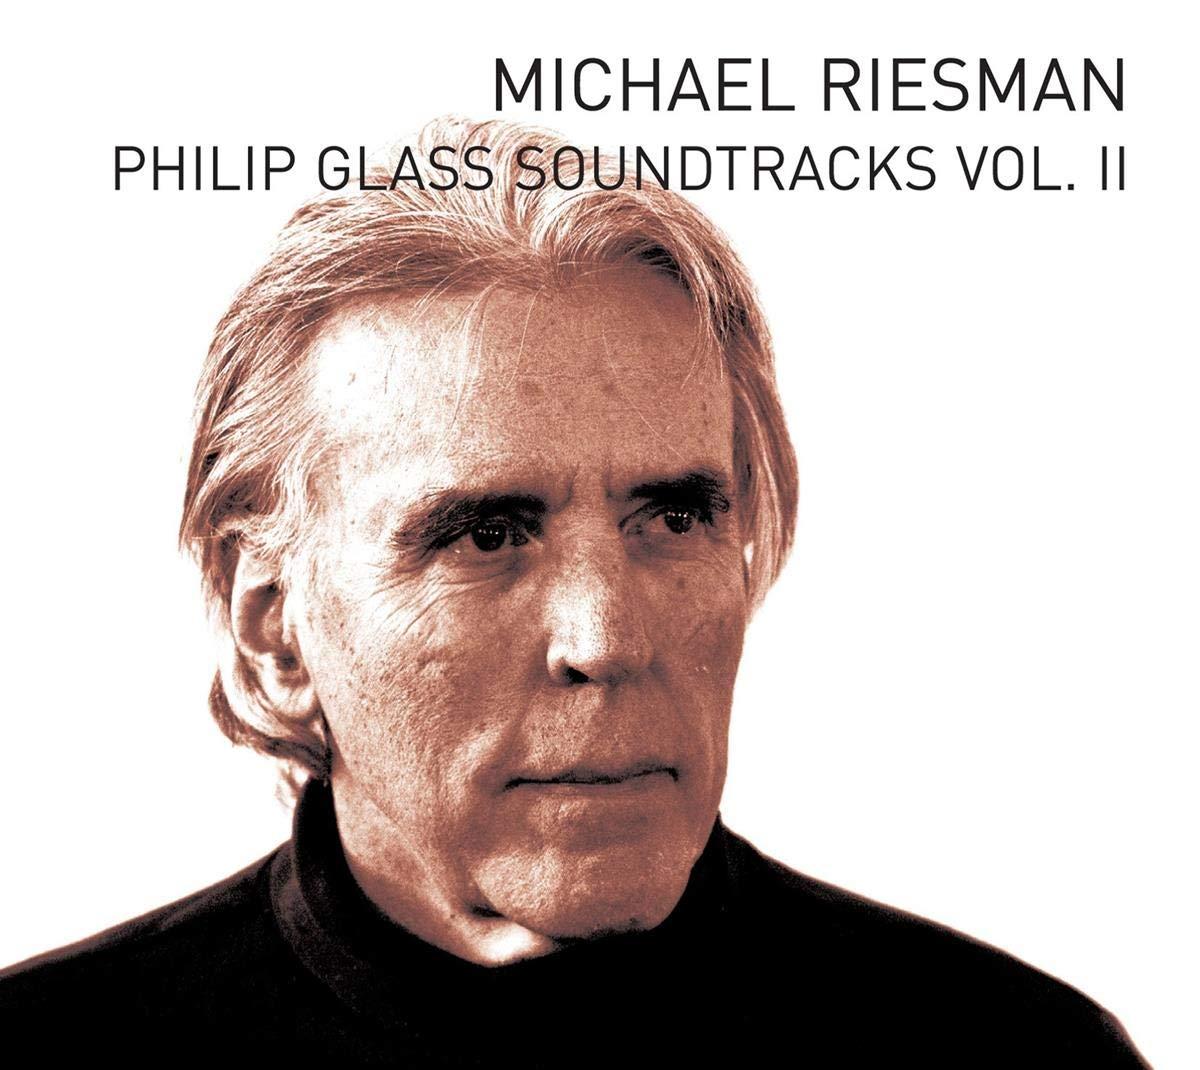 Philip Glass Vol.ii Over High material item handling ☆ Soundtracks